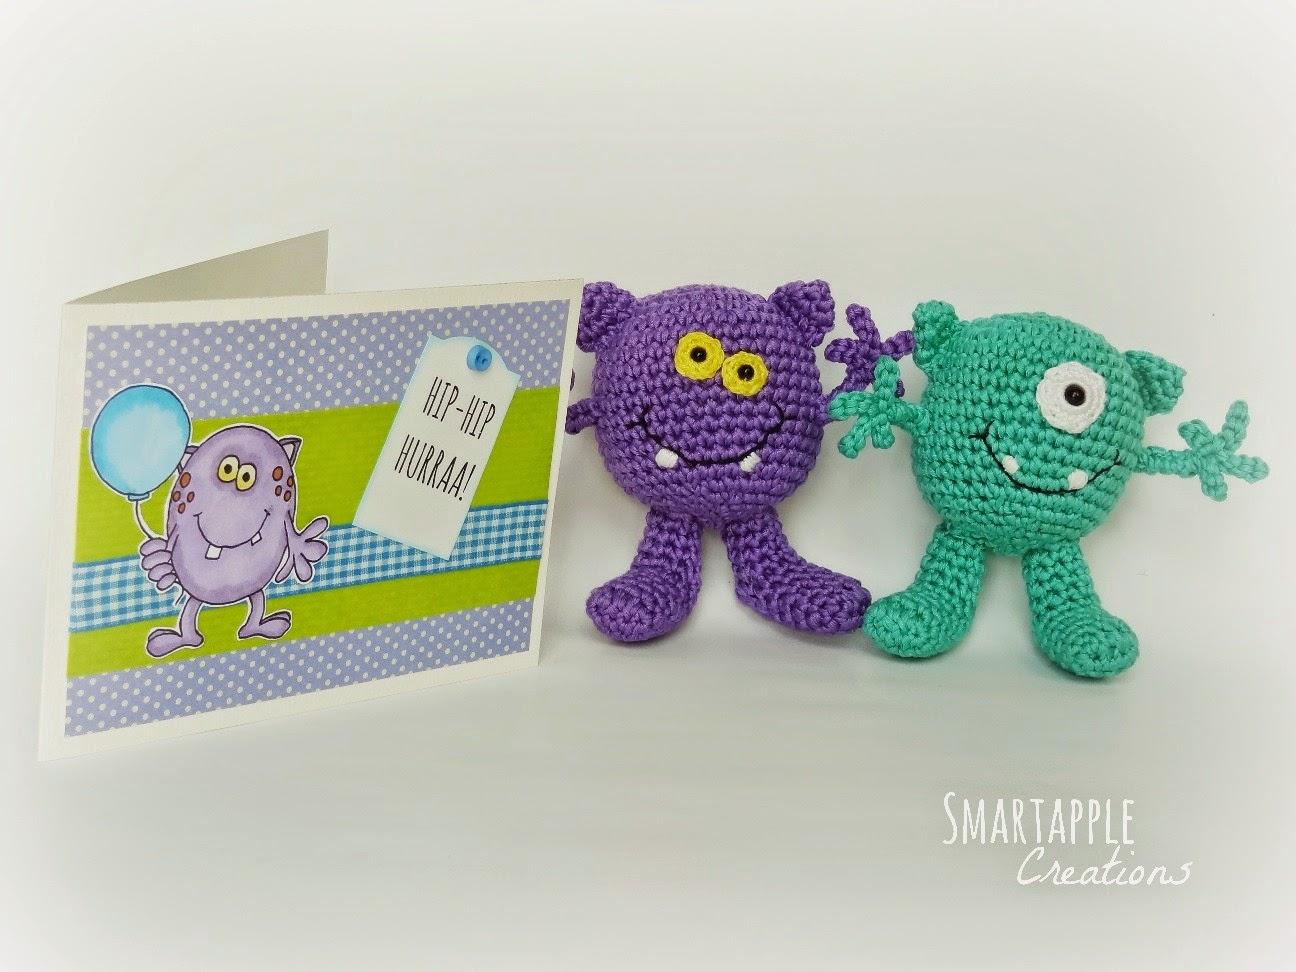 Smartapple Creations - amigurumi and crochet: Little ...